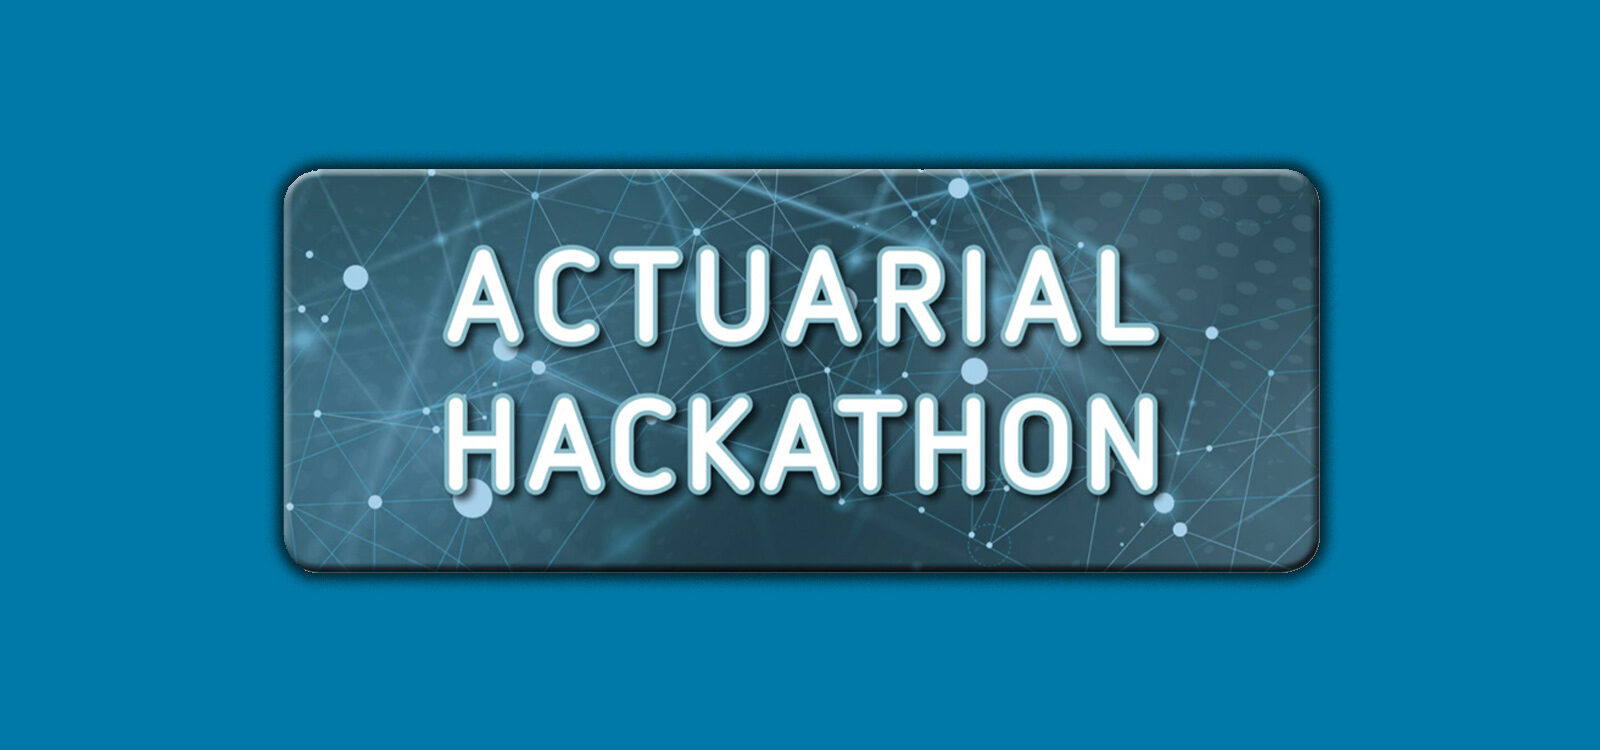 2021 Actuarial Hackathon Showcase